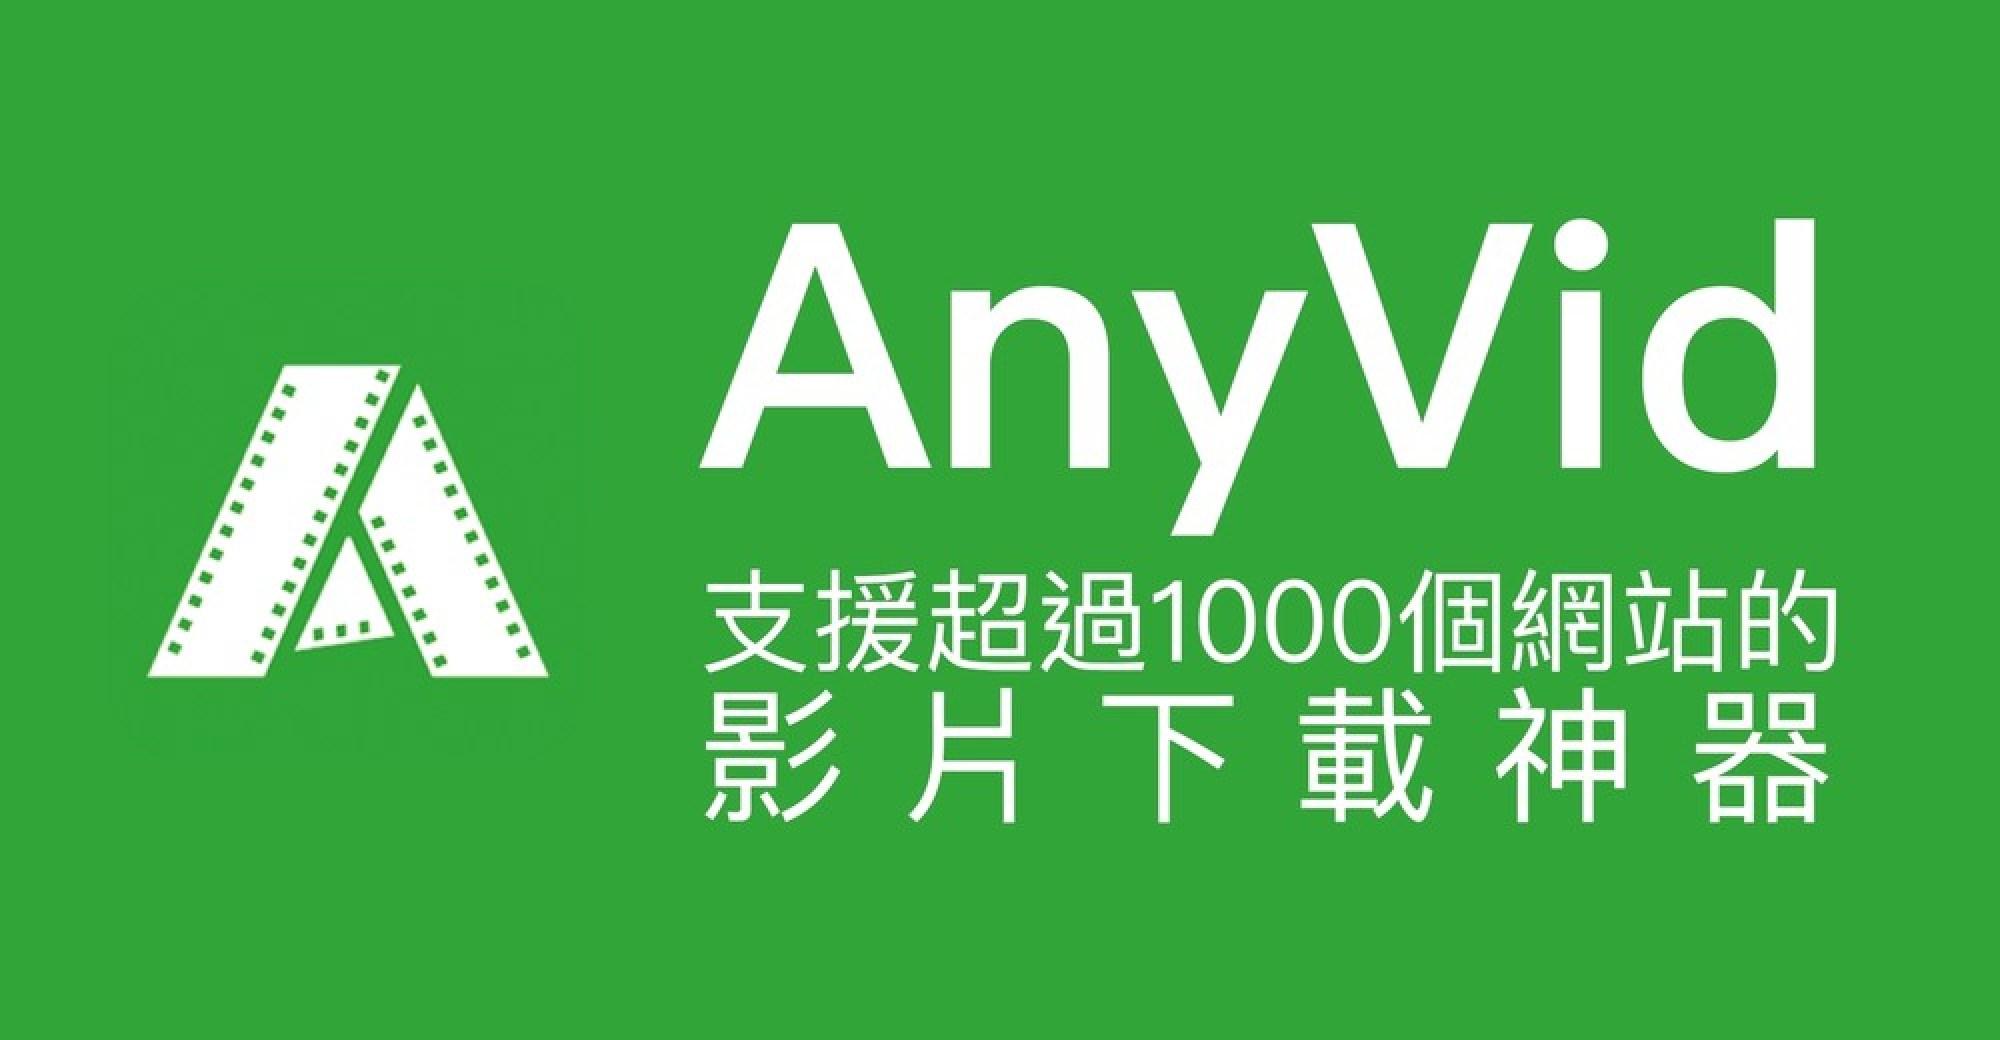 AnyVid 支援超過1000個網站的 影片下載神器